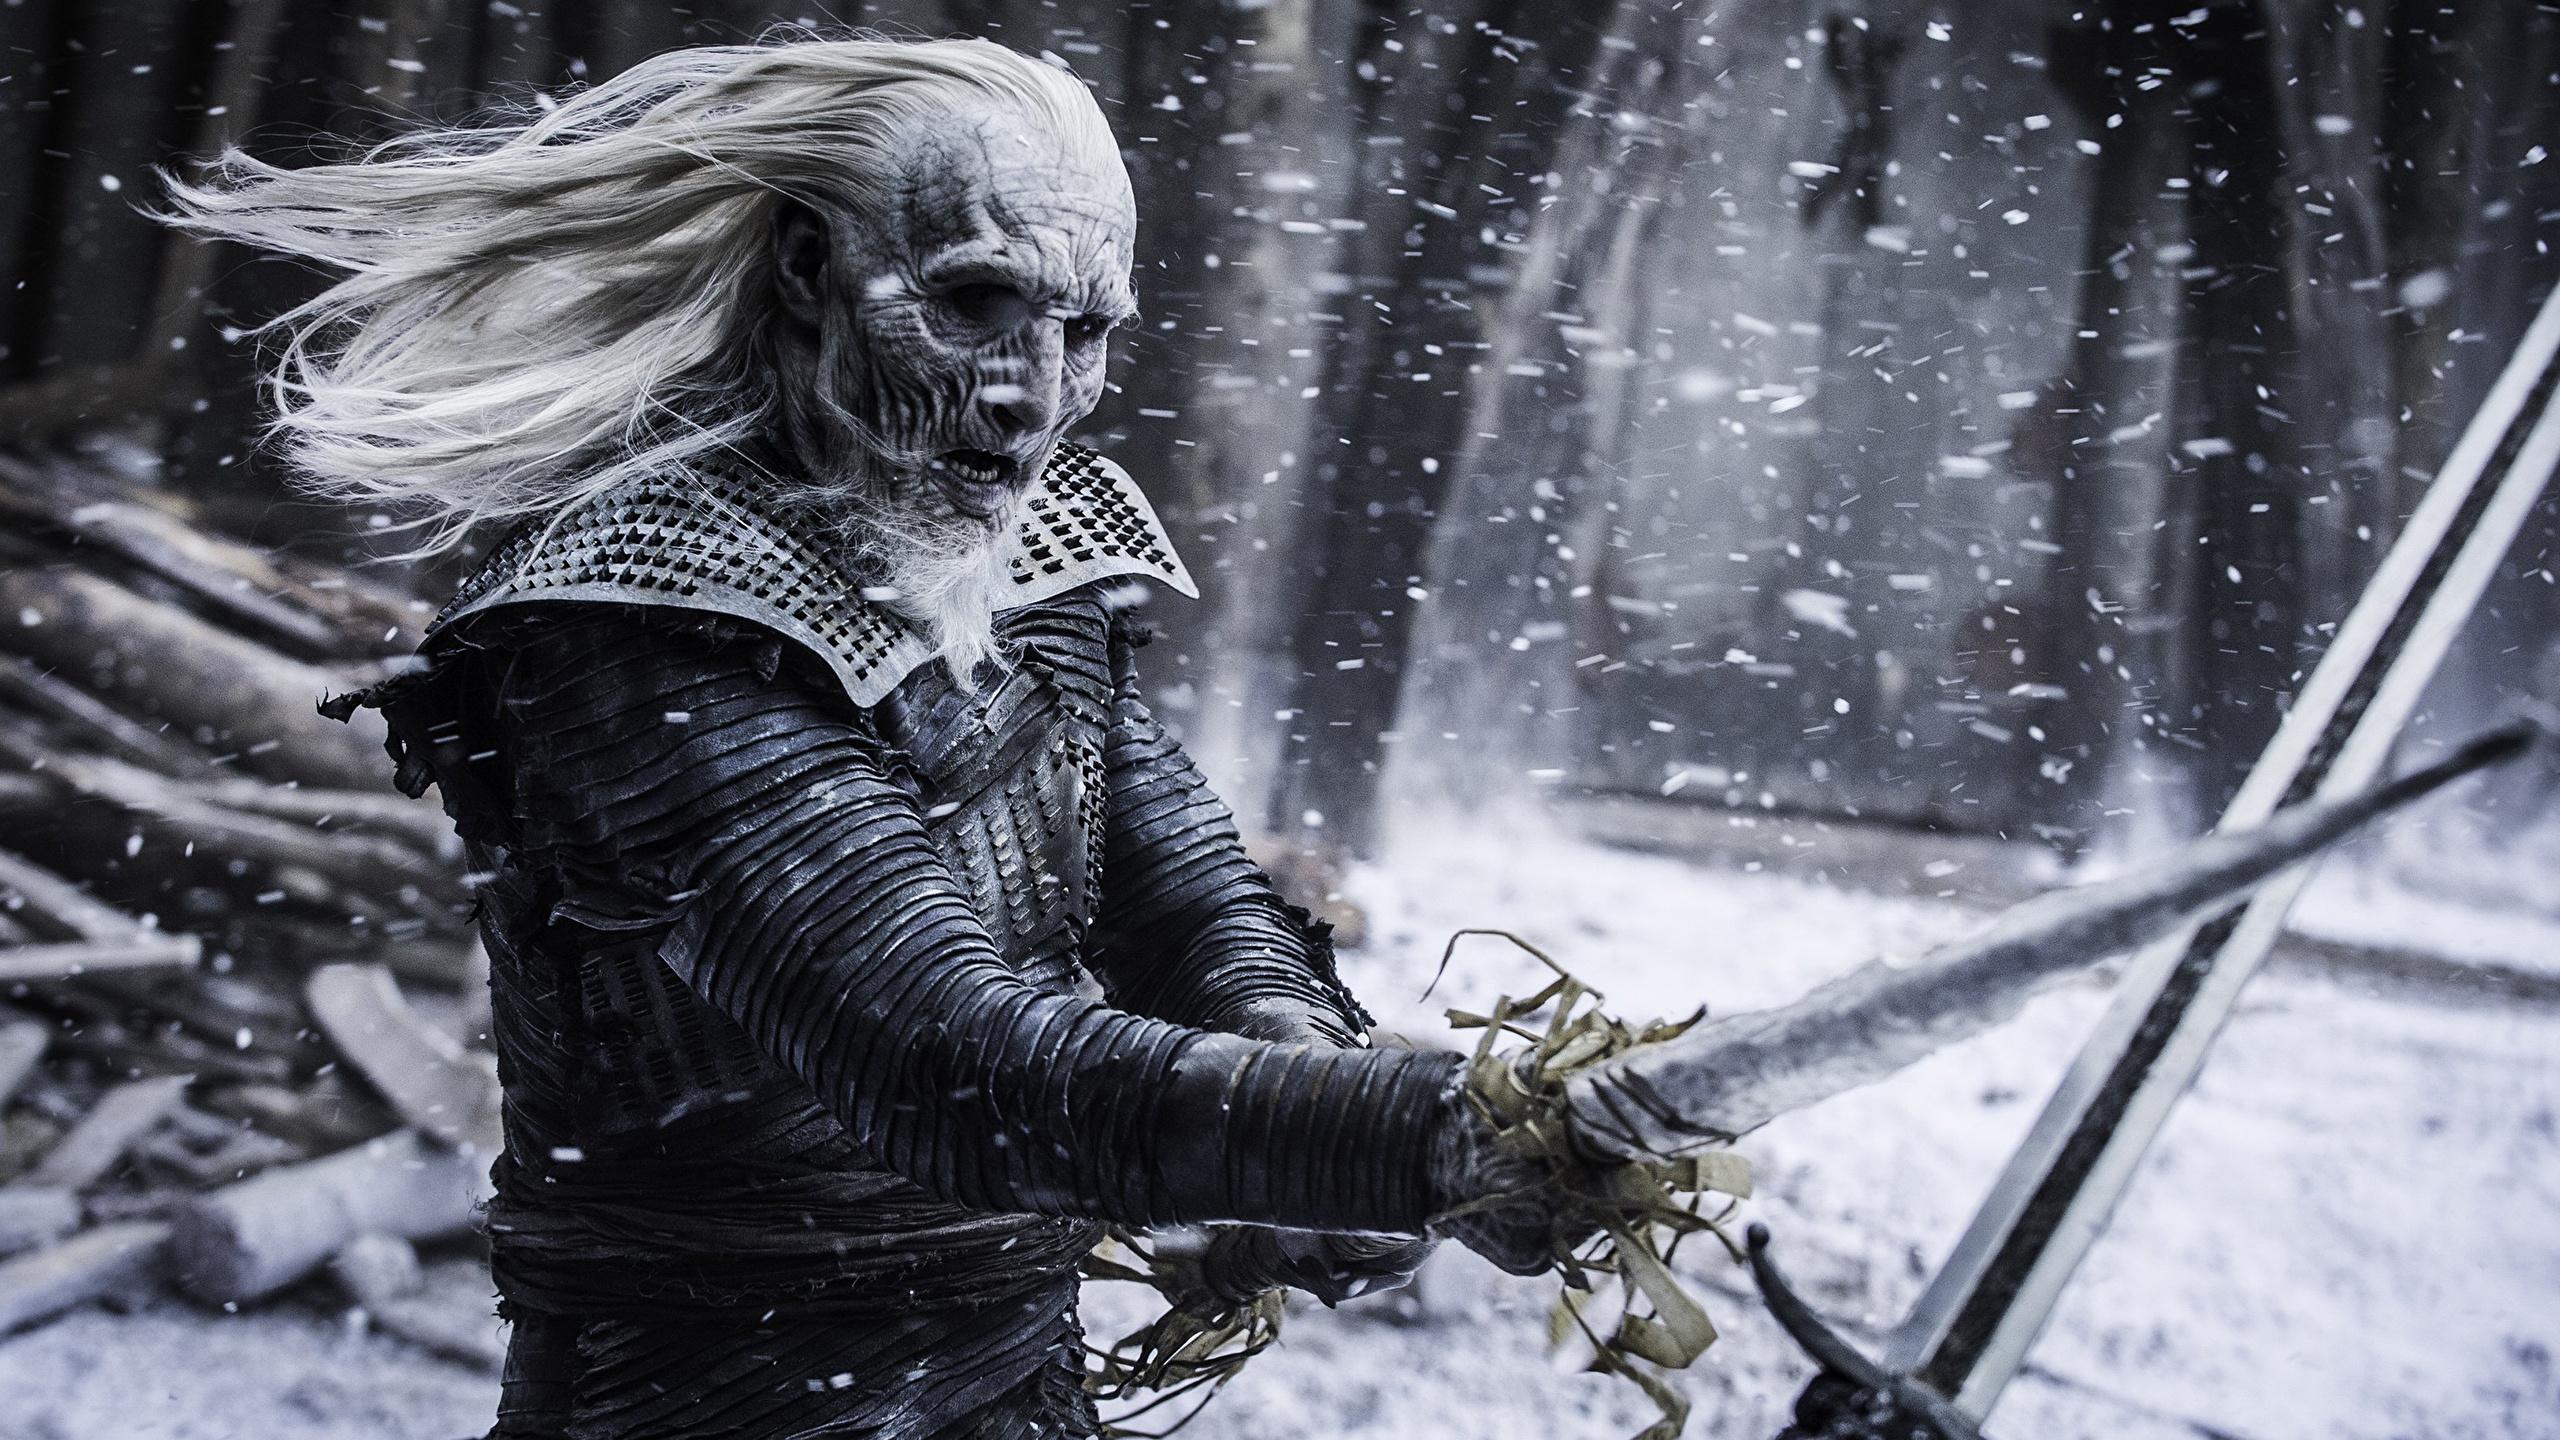 Photos Game Of Thrones Swords Season 7 White Walkers Fight 2560x1440